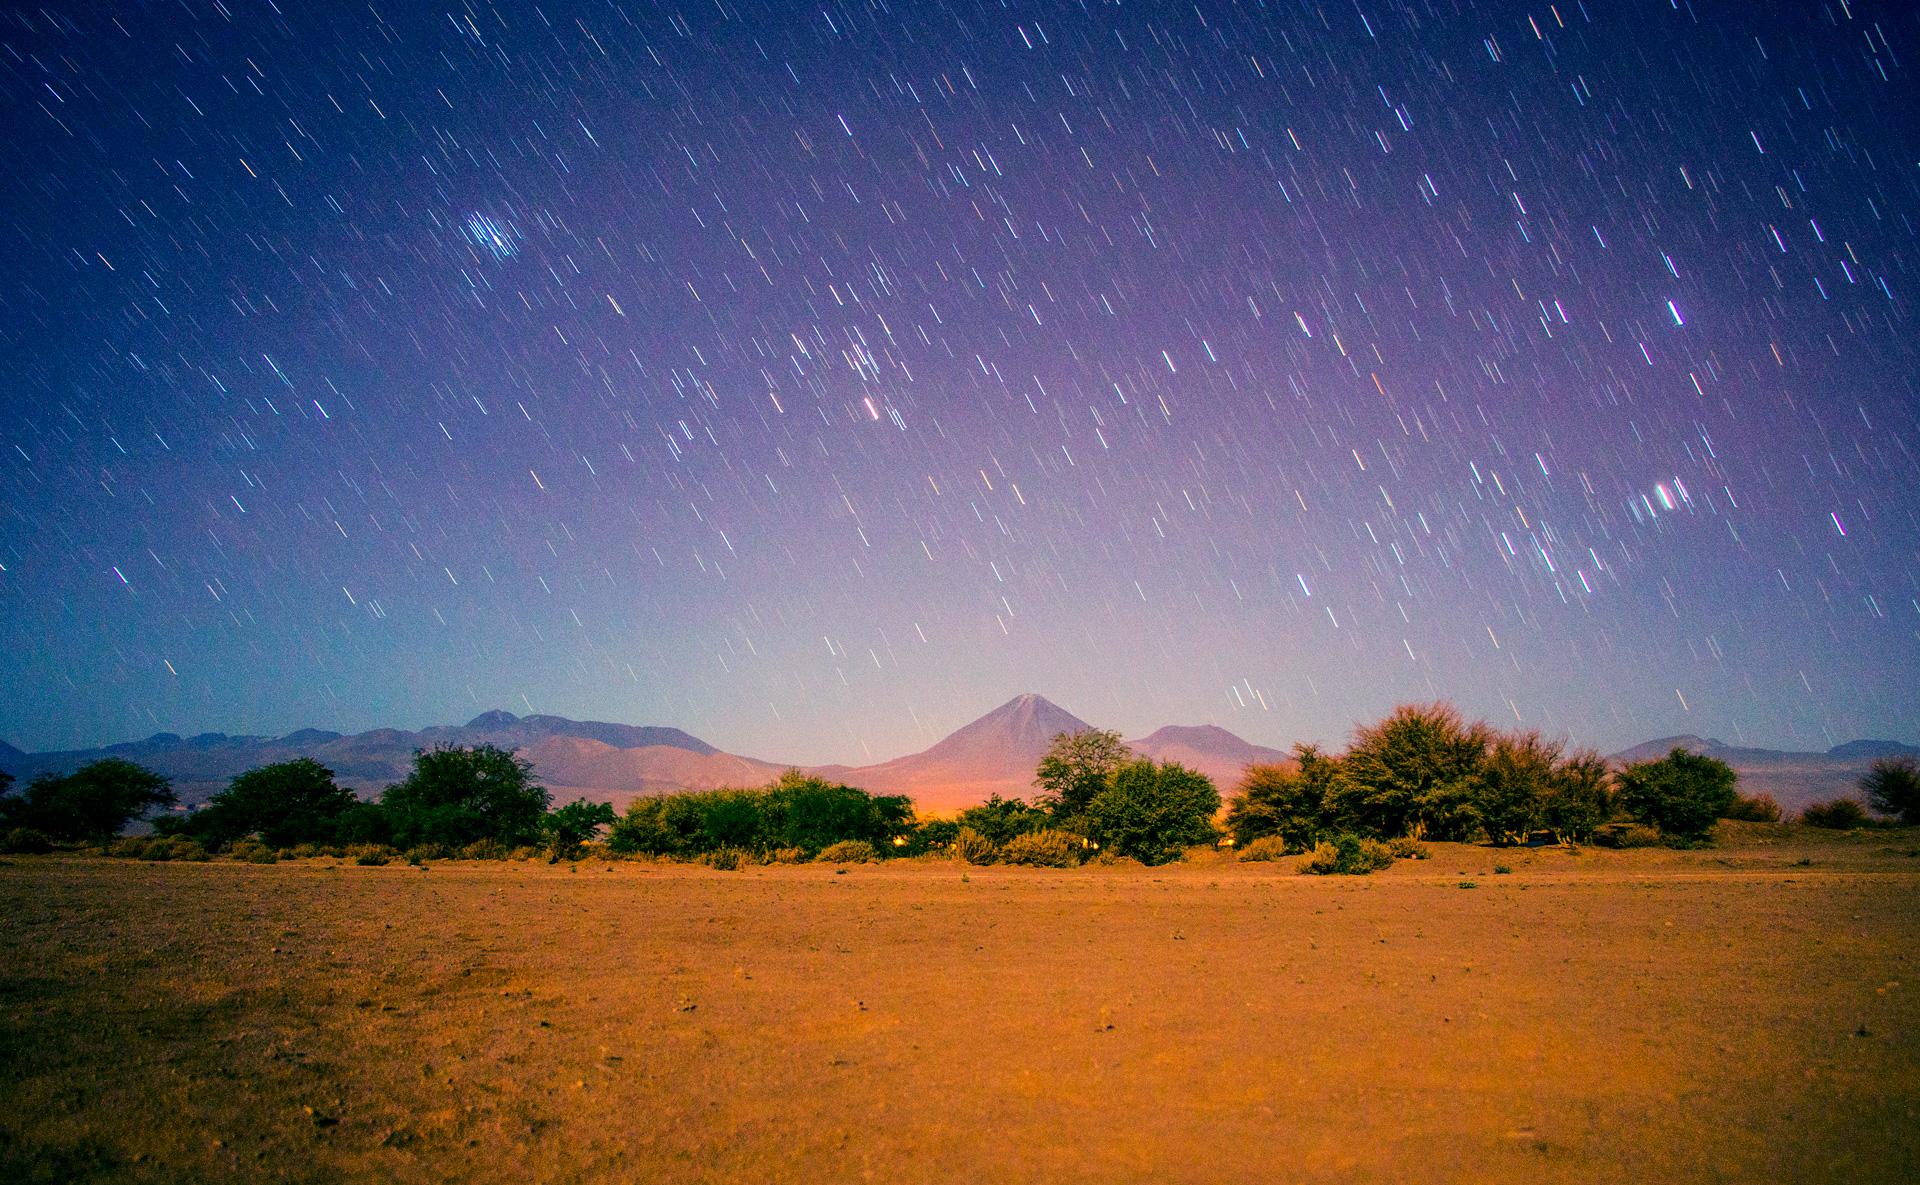 stargazing-atacama-desert-licancabur-olcano